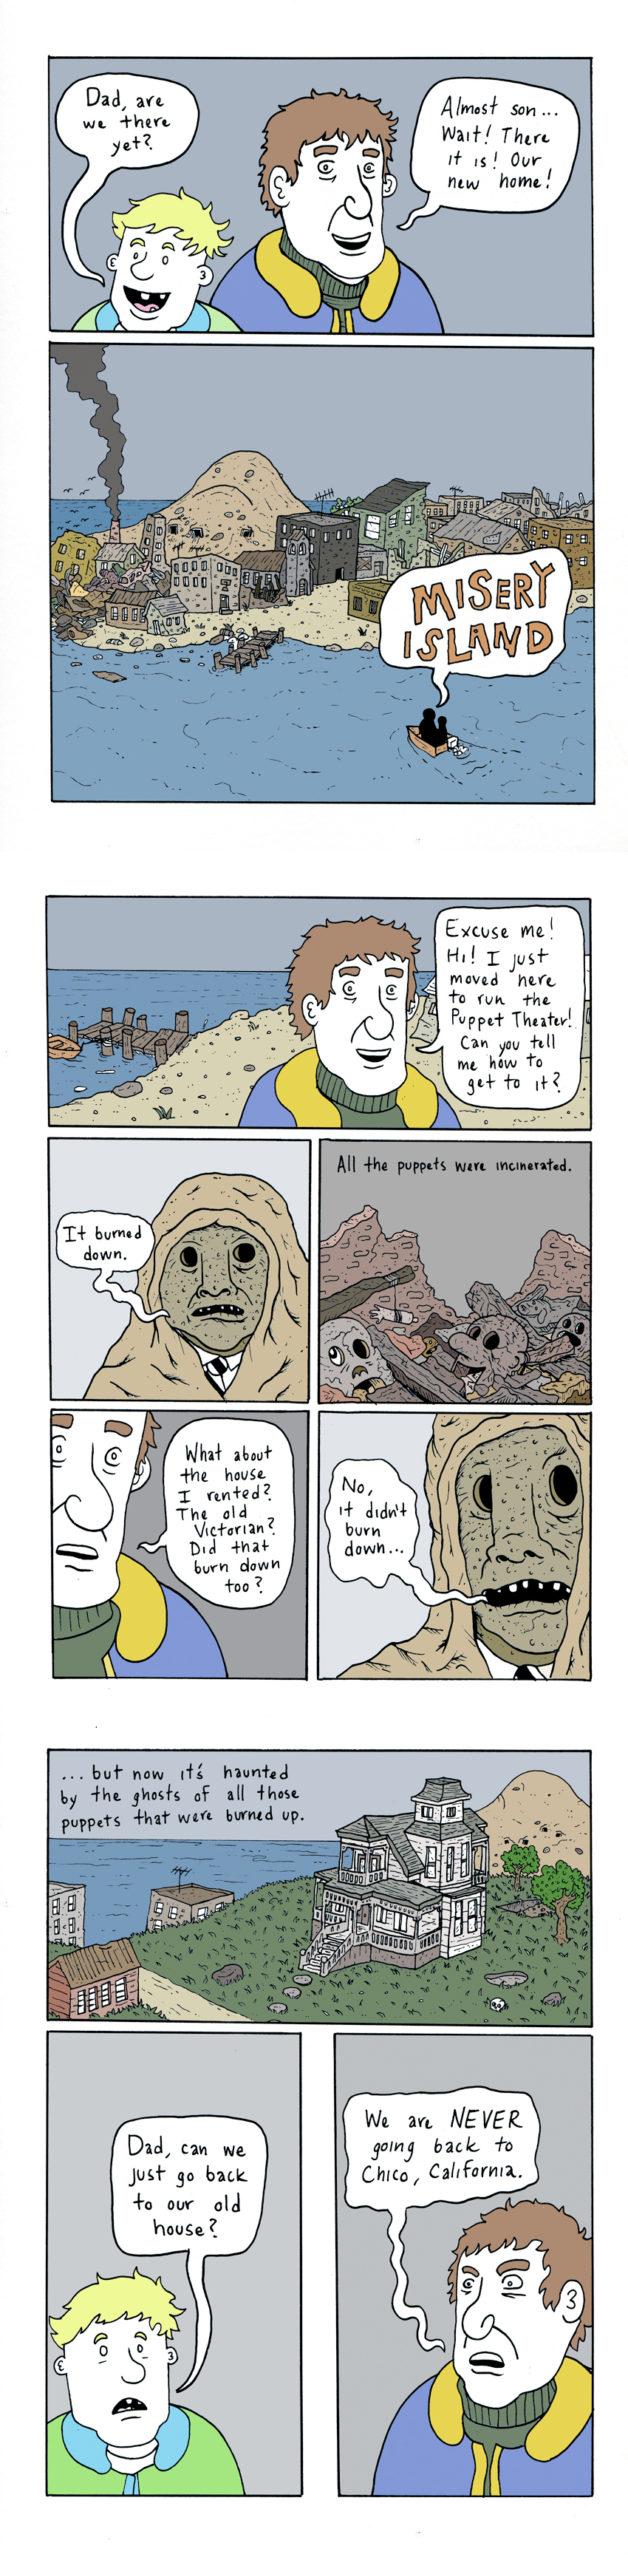 Misery Island